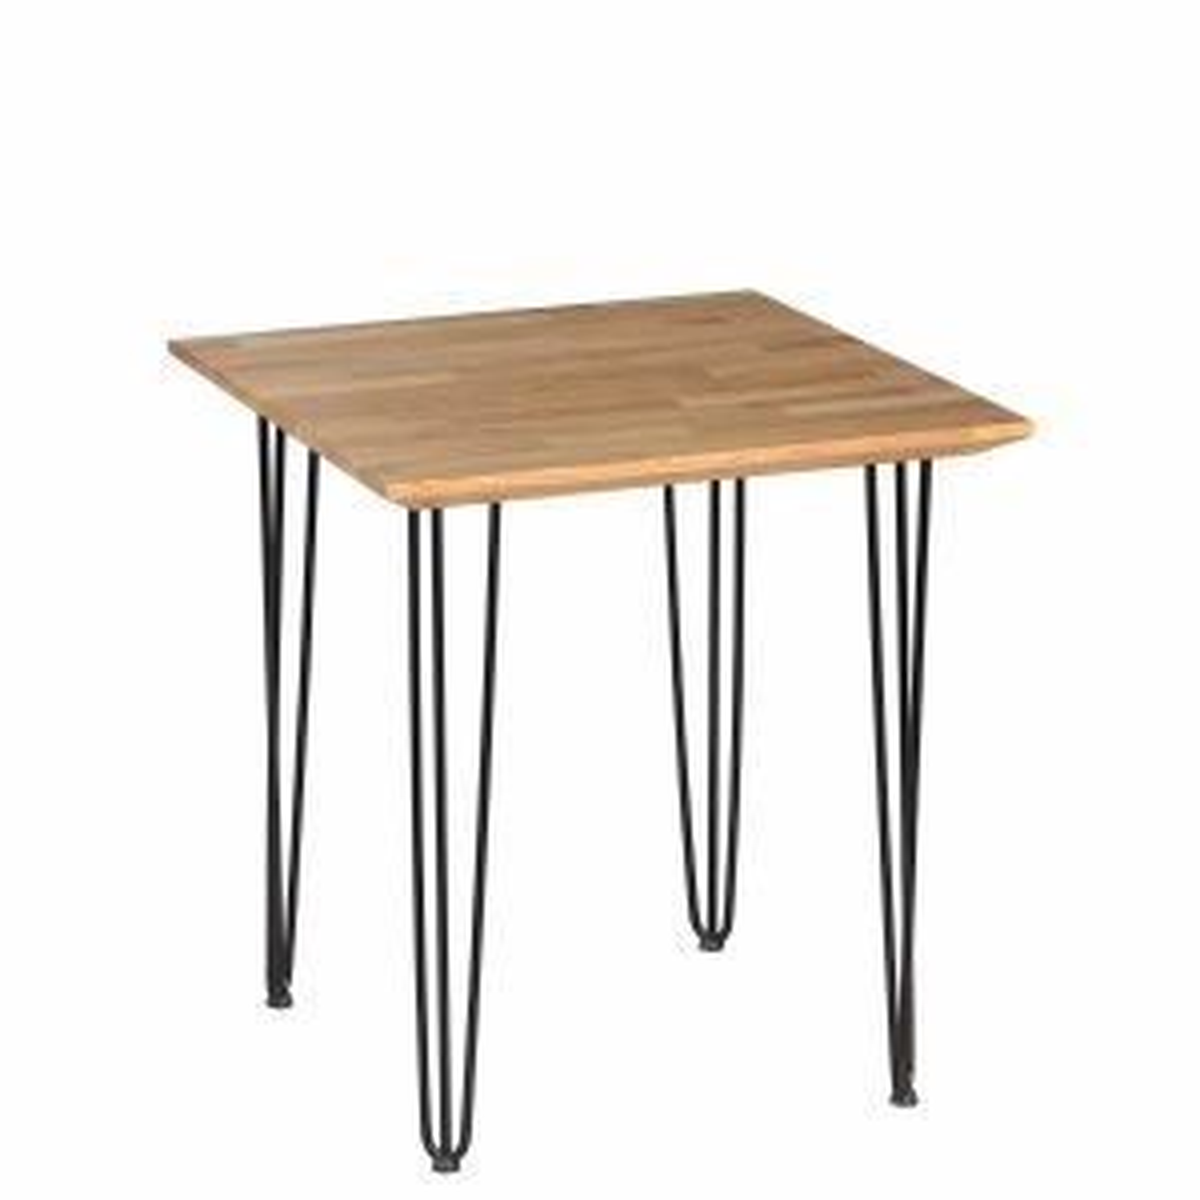 Stół IRON OAK 40 70x70 dąb/czarny